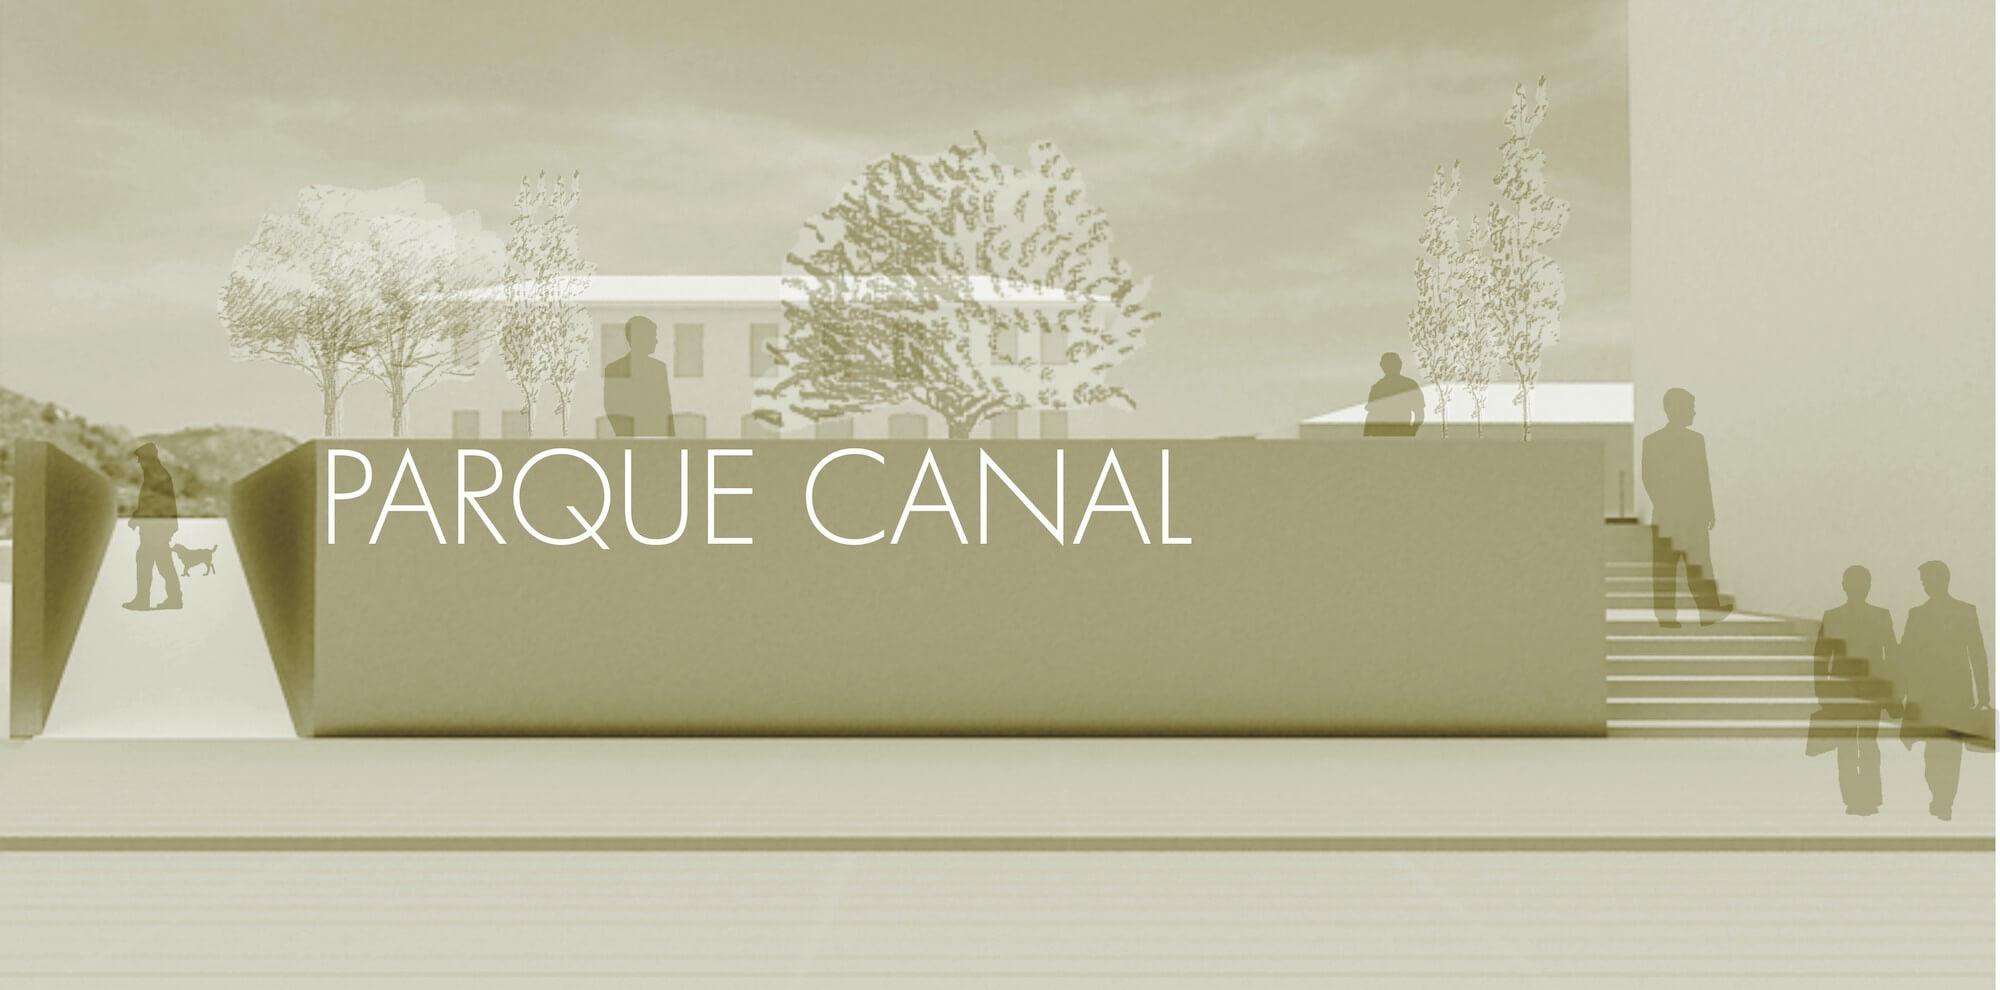 Parque Canal